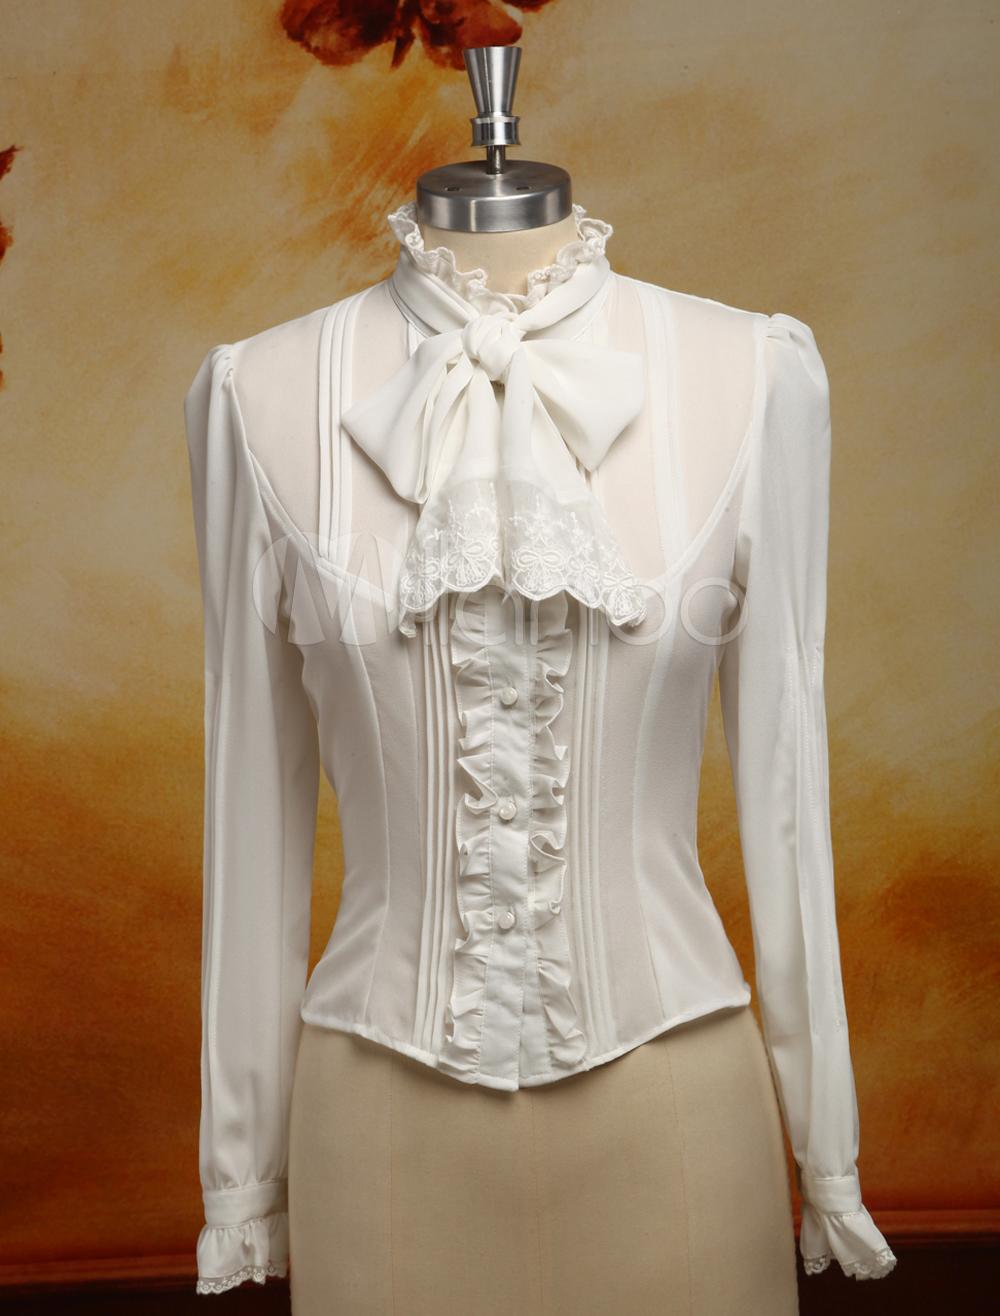 White Chiffon Lolita Blouse Long Sleeves Stand Collar Lace Trim Ruffles